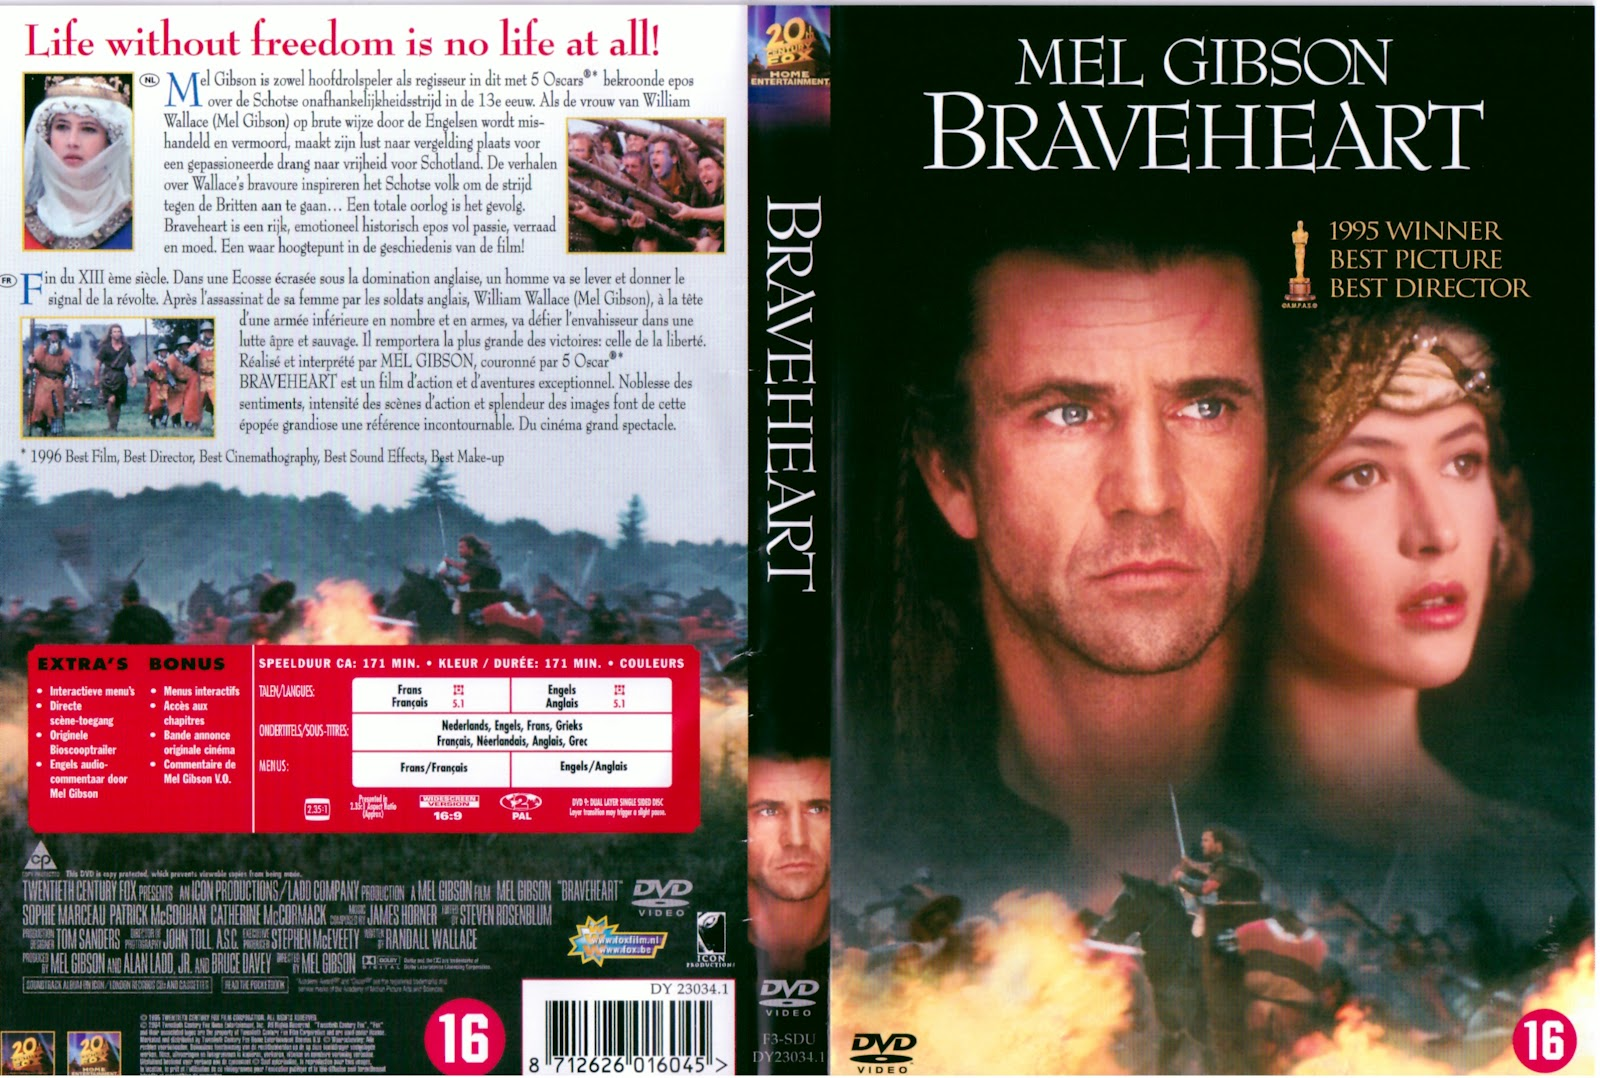 Braveheart Dvd Cover